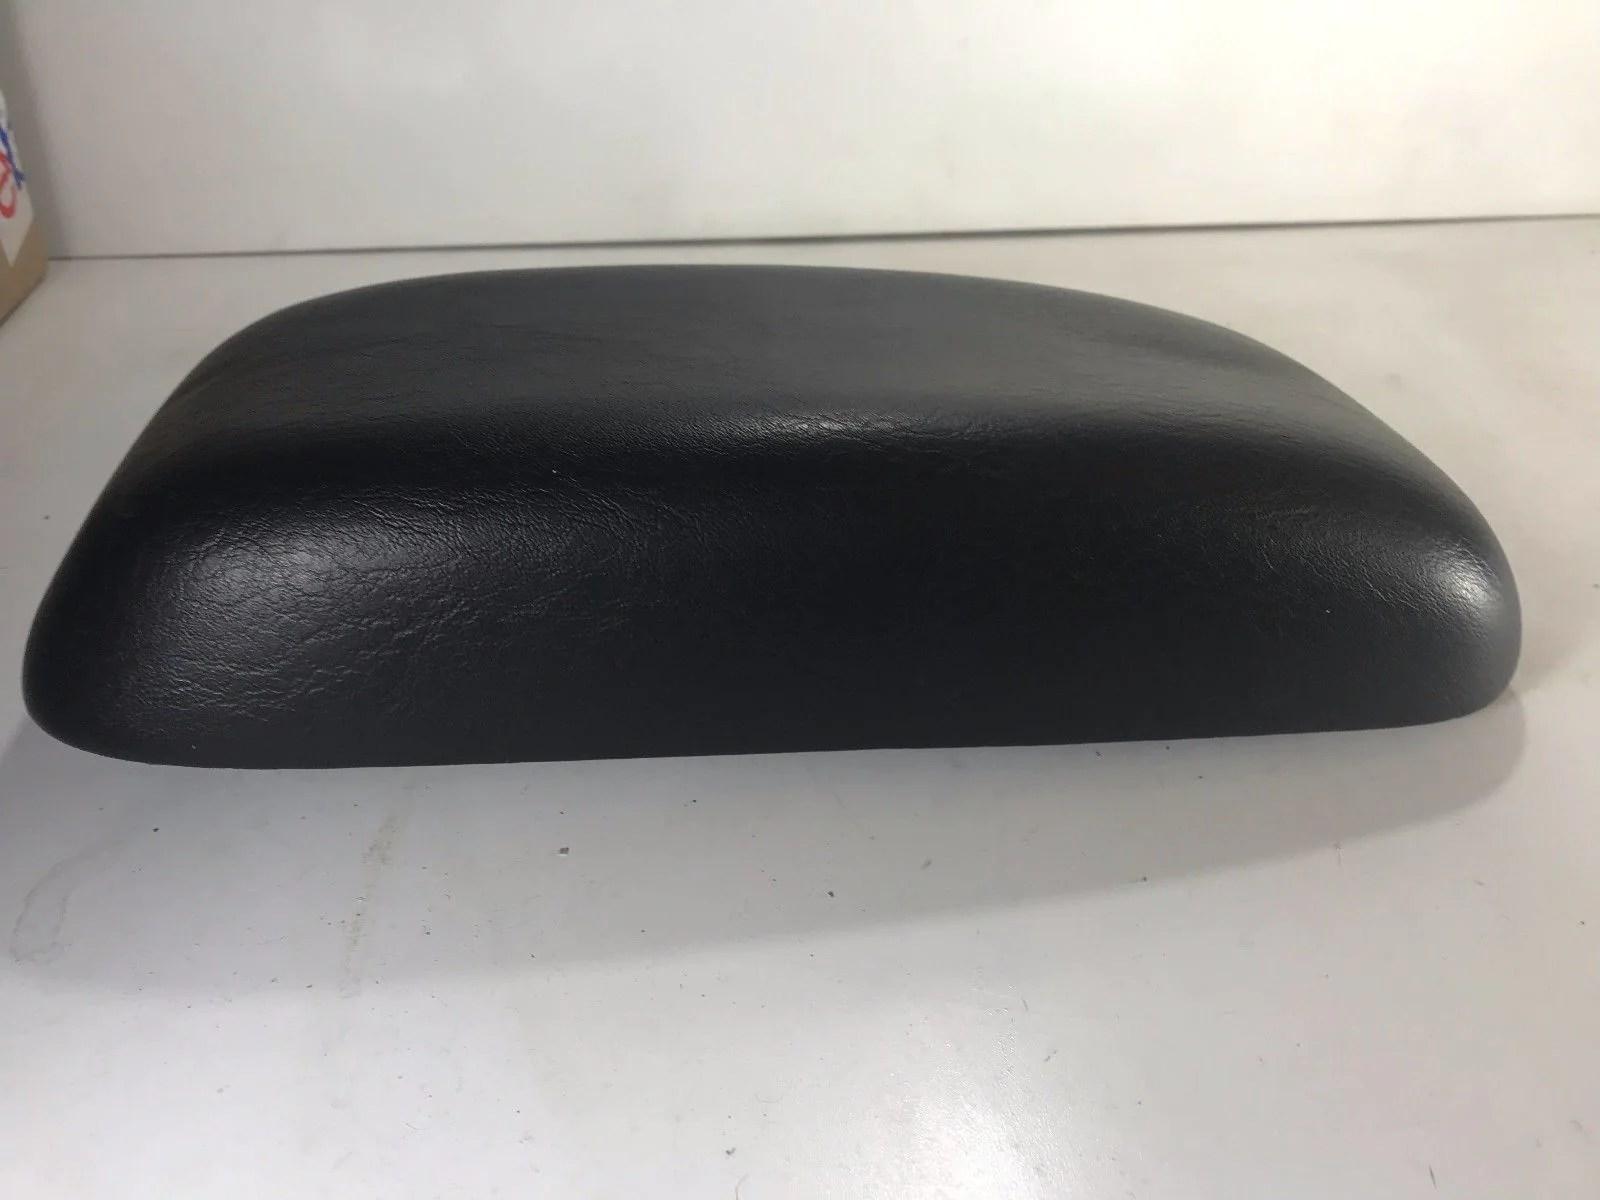 medium resolution of  2000 2005 dodge neon center console arm rest armrest lid top black